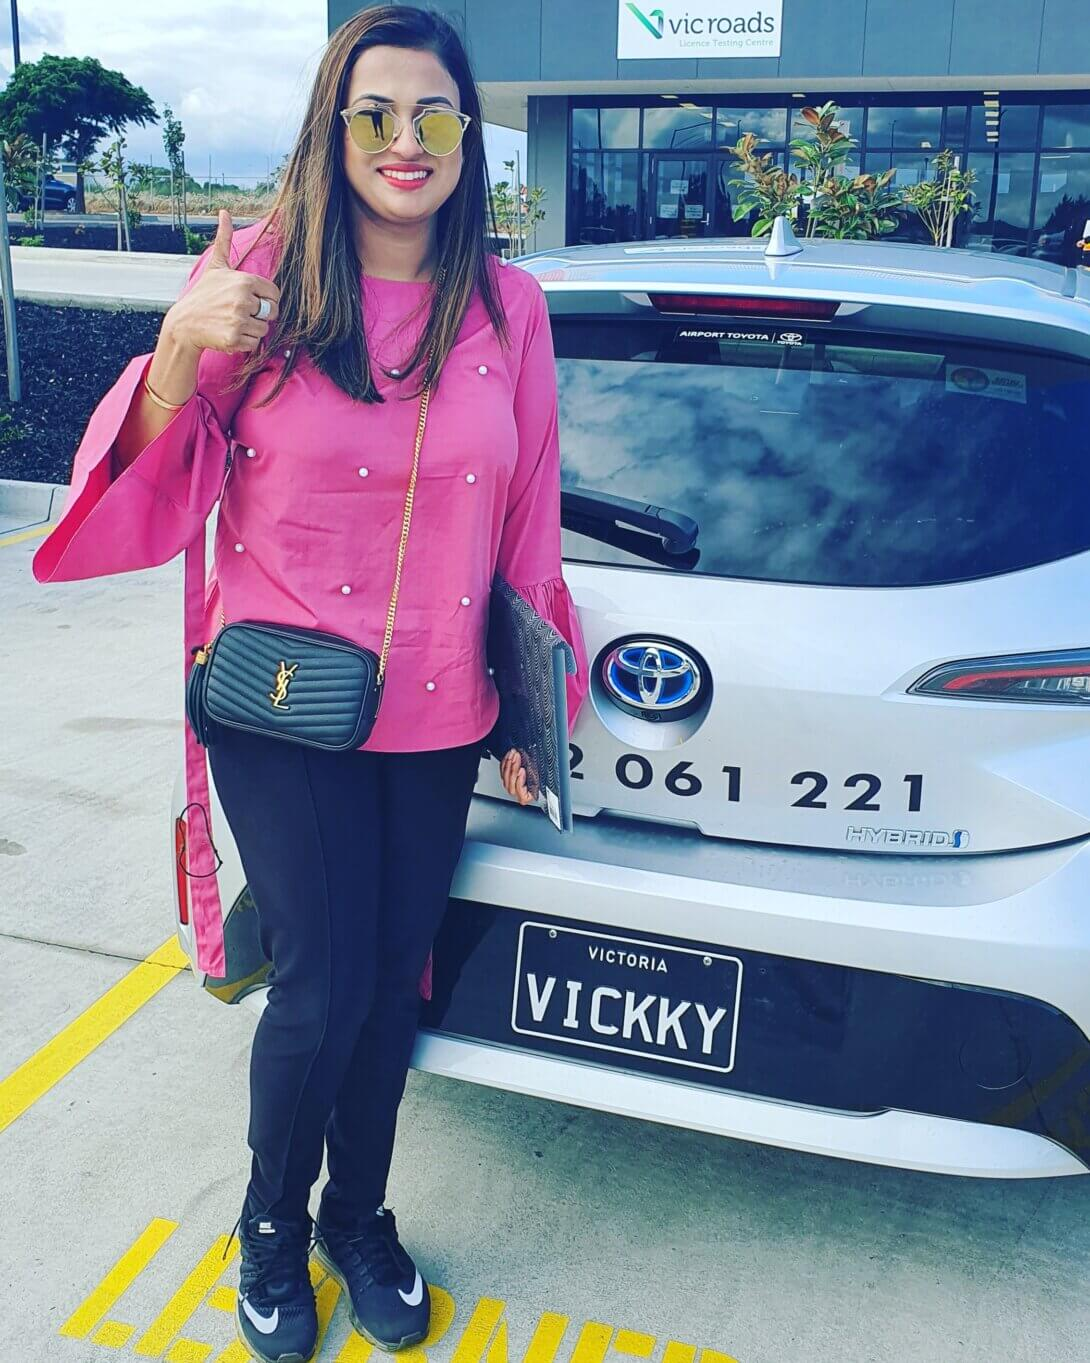 Vicky Driving School Broadmeadows